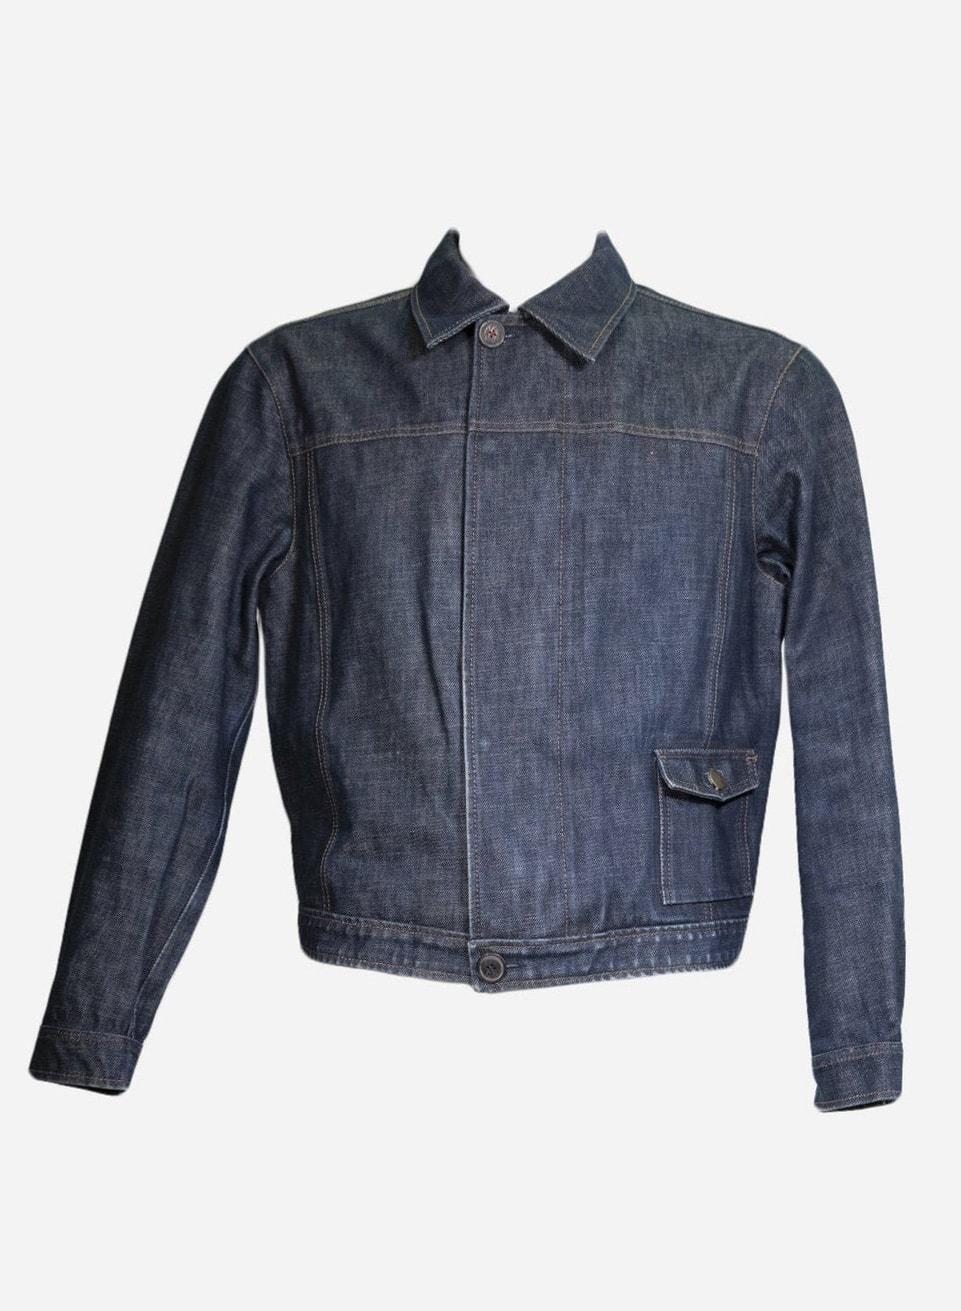 PRADA -Polyester jacket